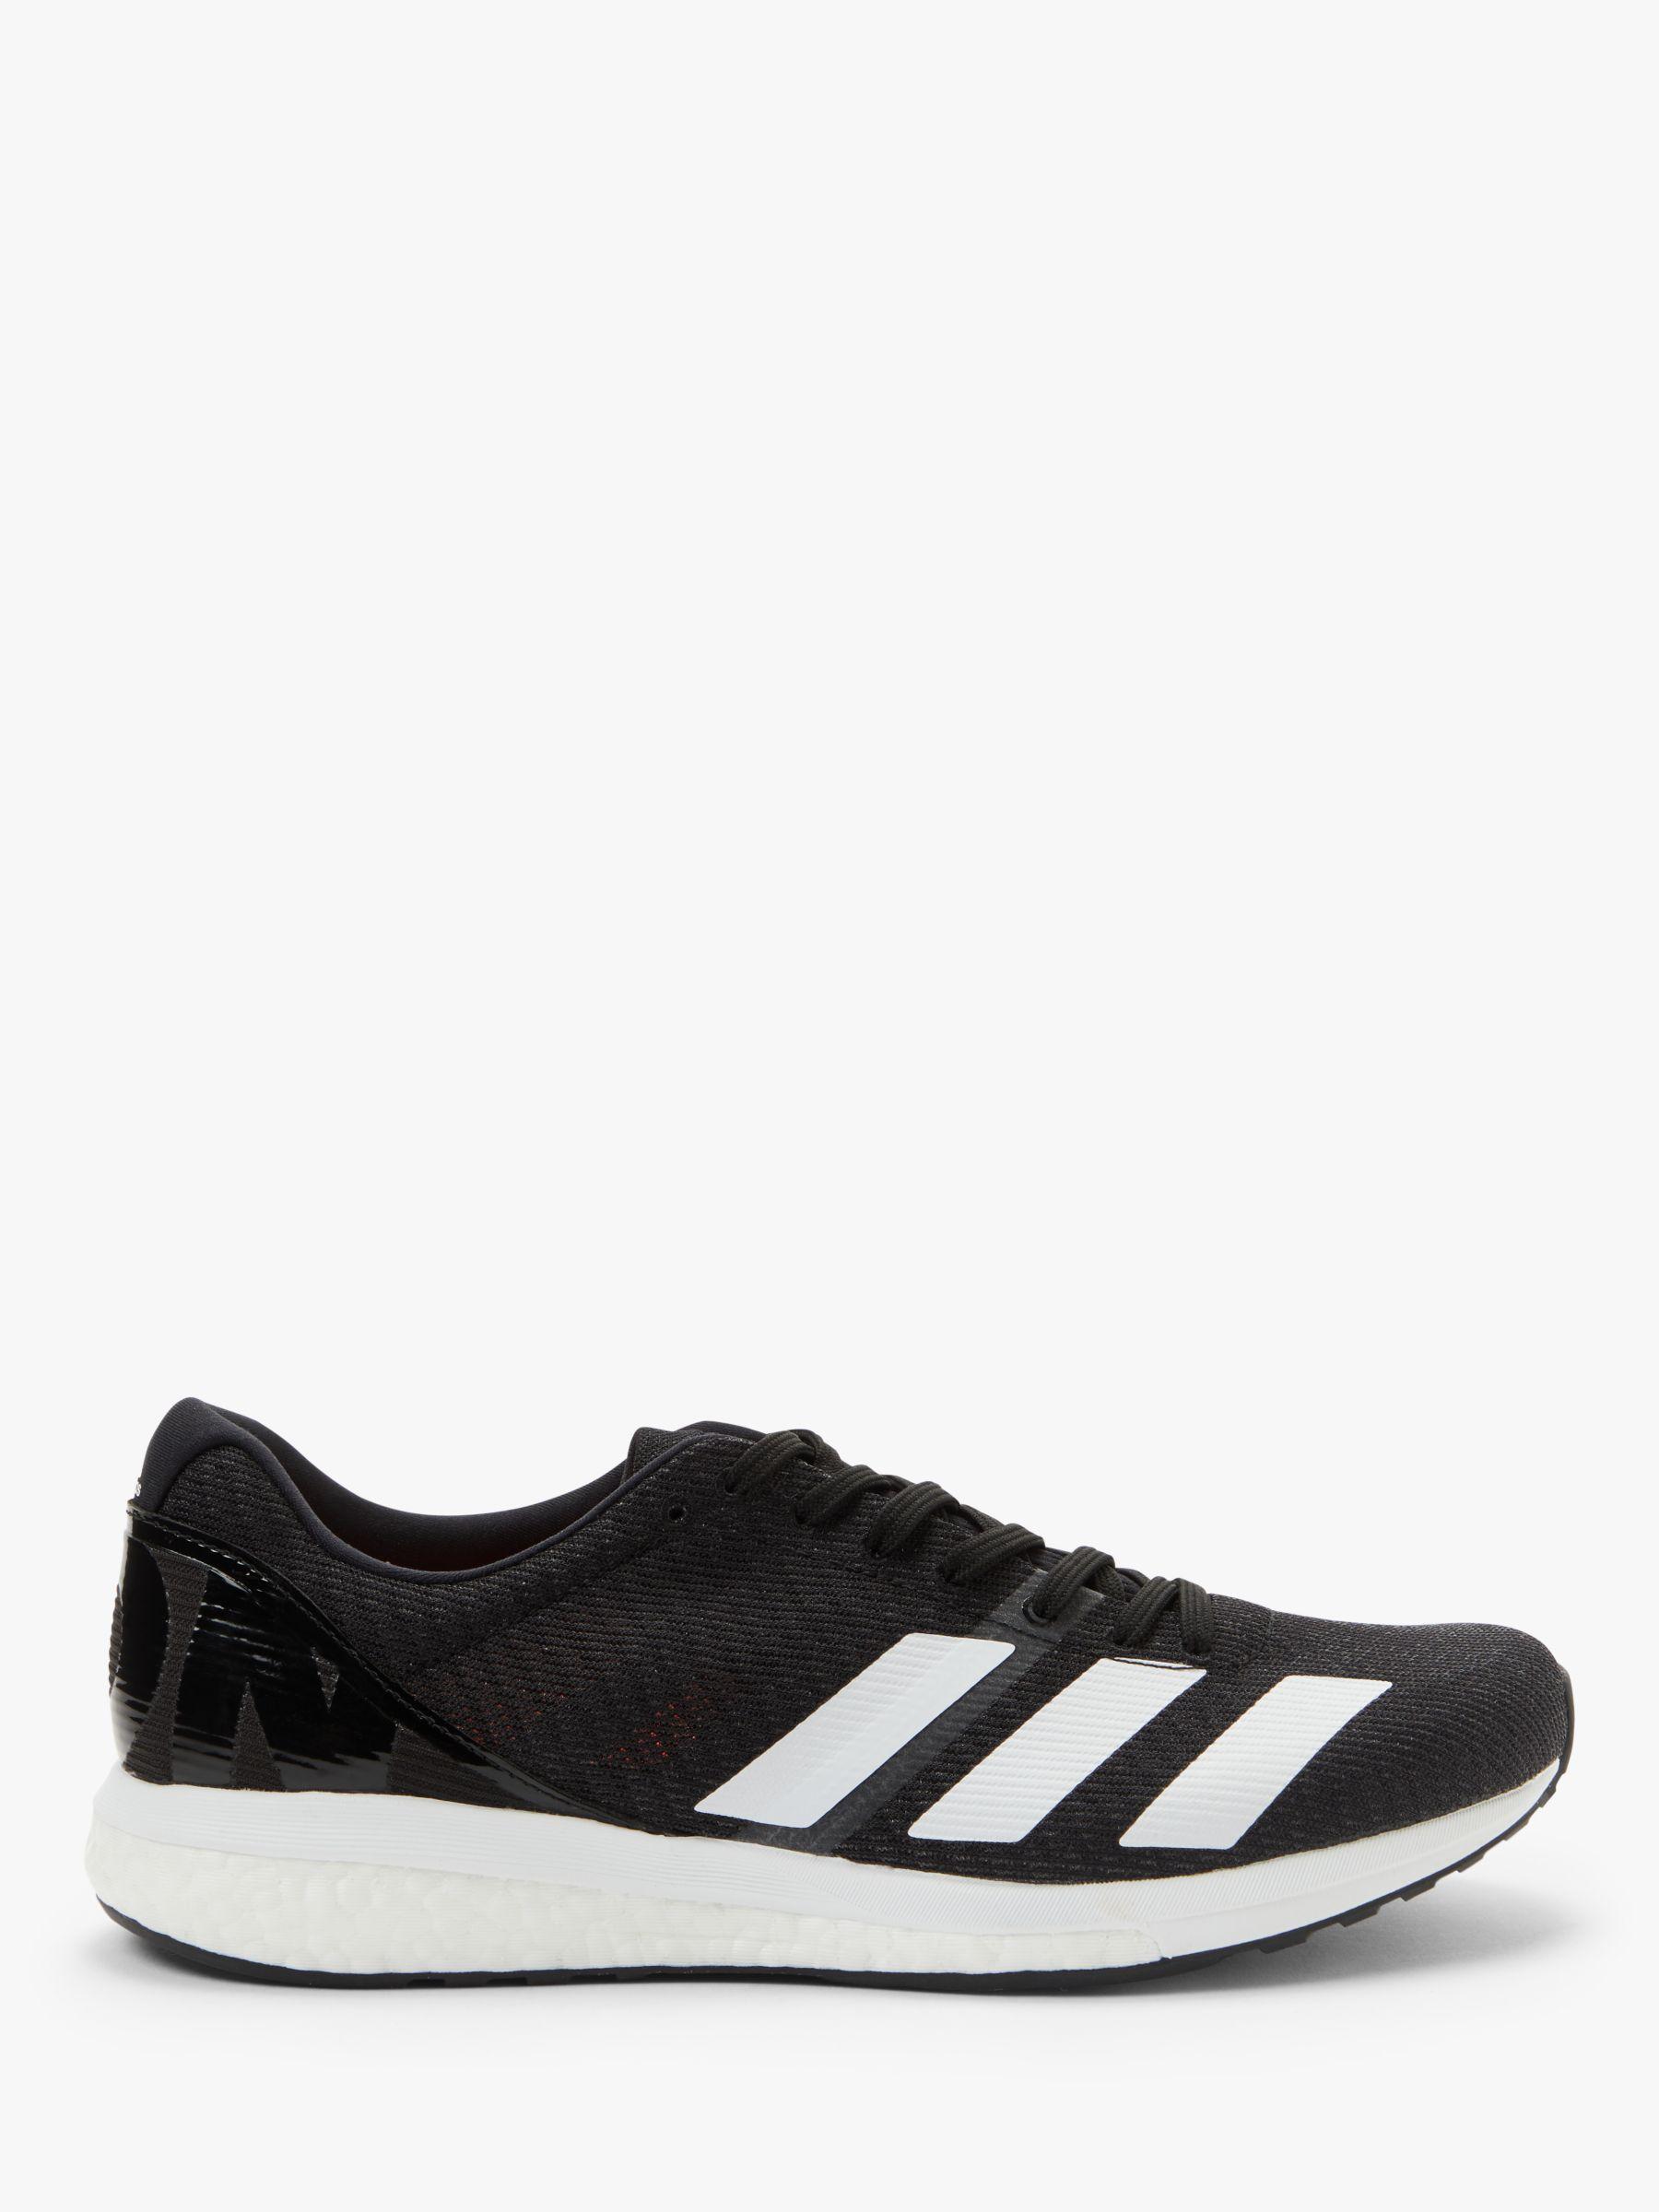 adidas Adizero Boston 8 Women's Running Shoes, Core Black